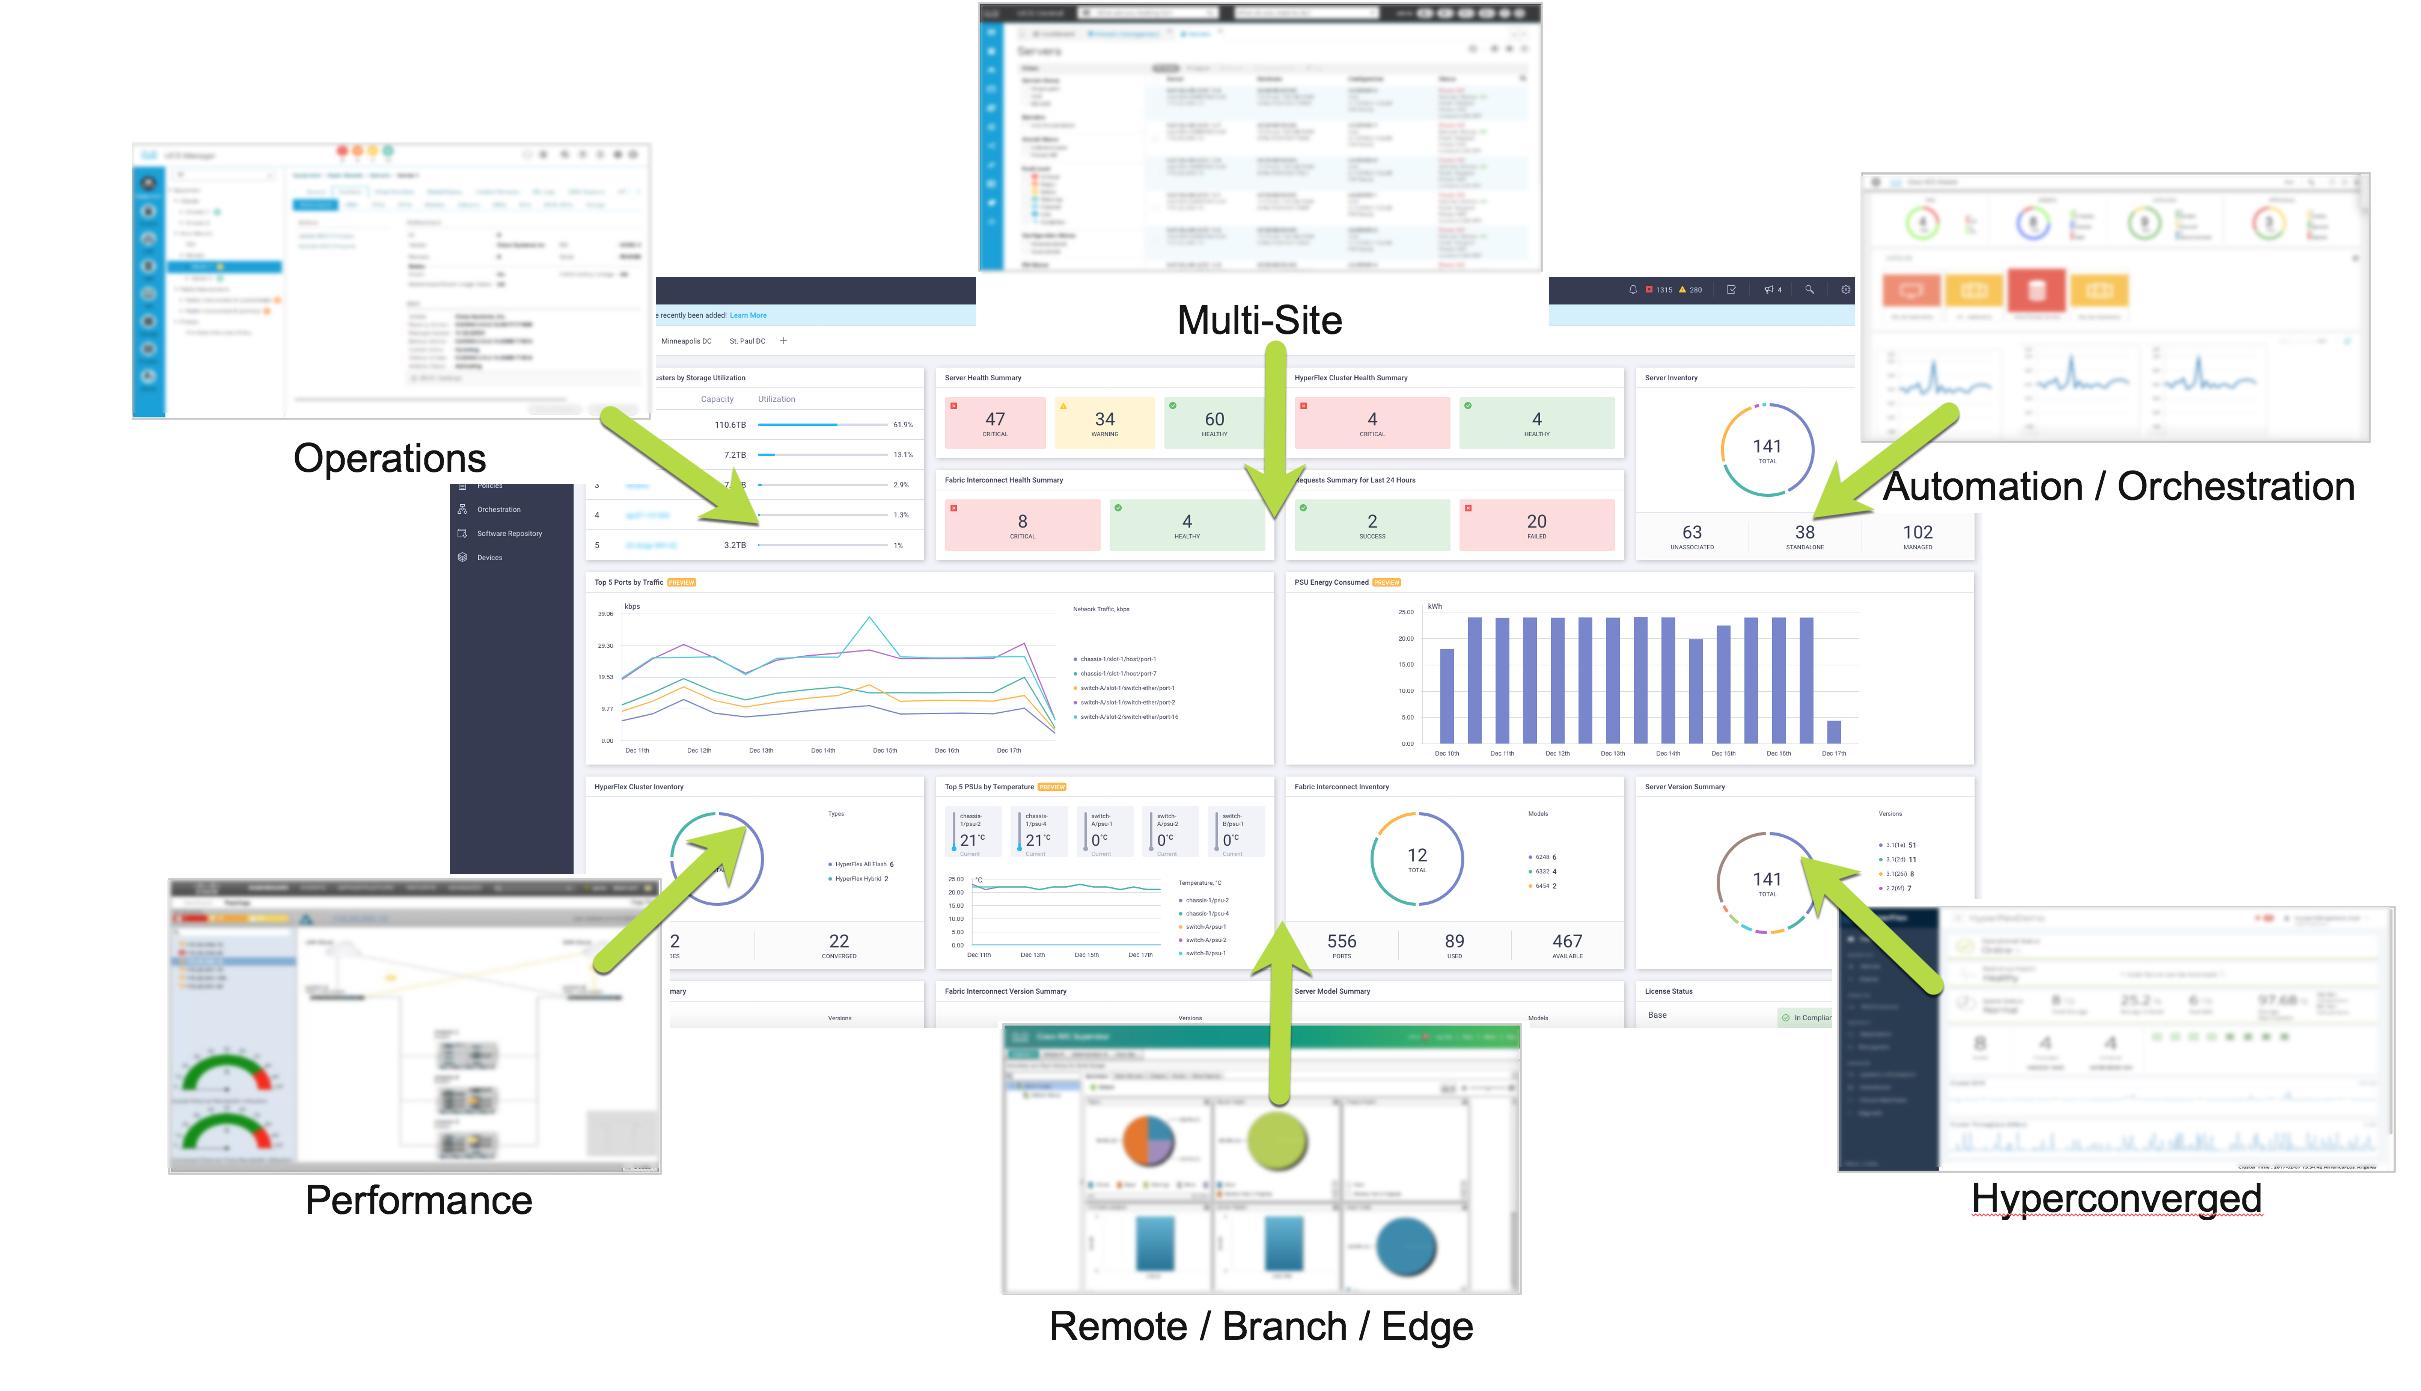 Cisco Intersight single-pane management